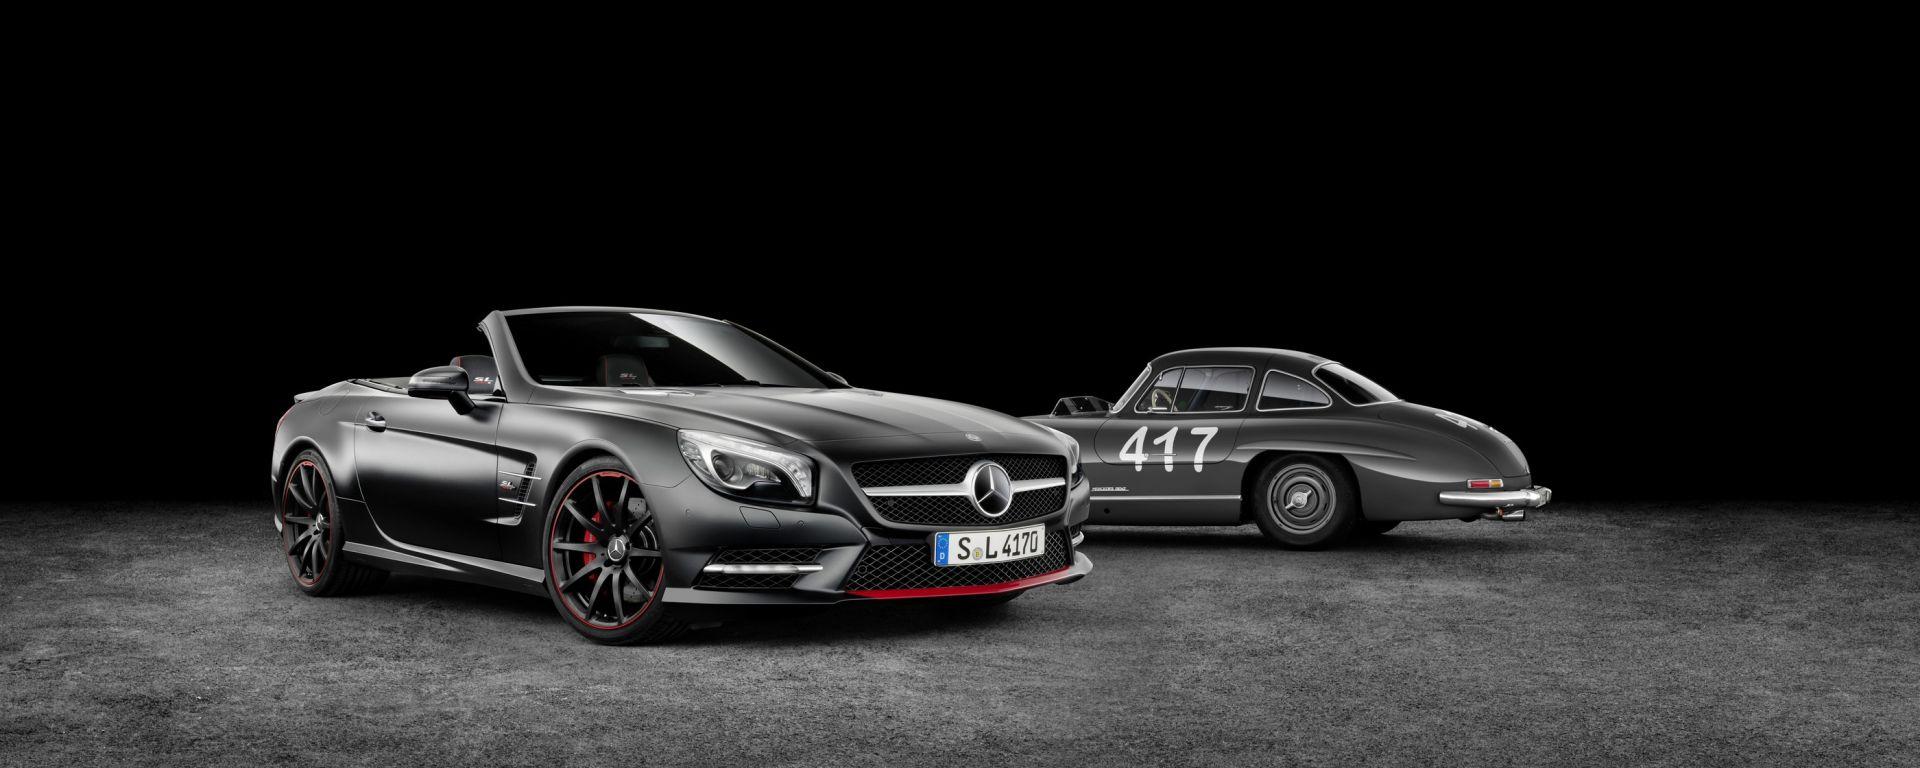 Mercedes SL Special Edition 'Mille Miglia 417'